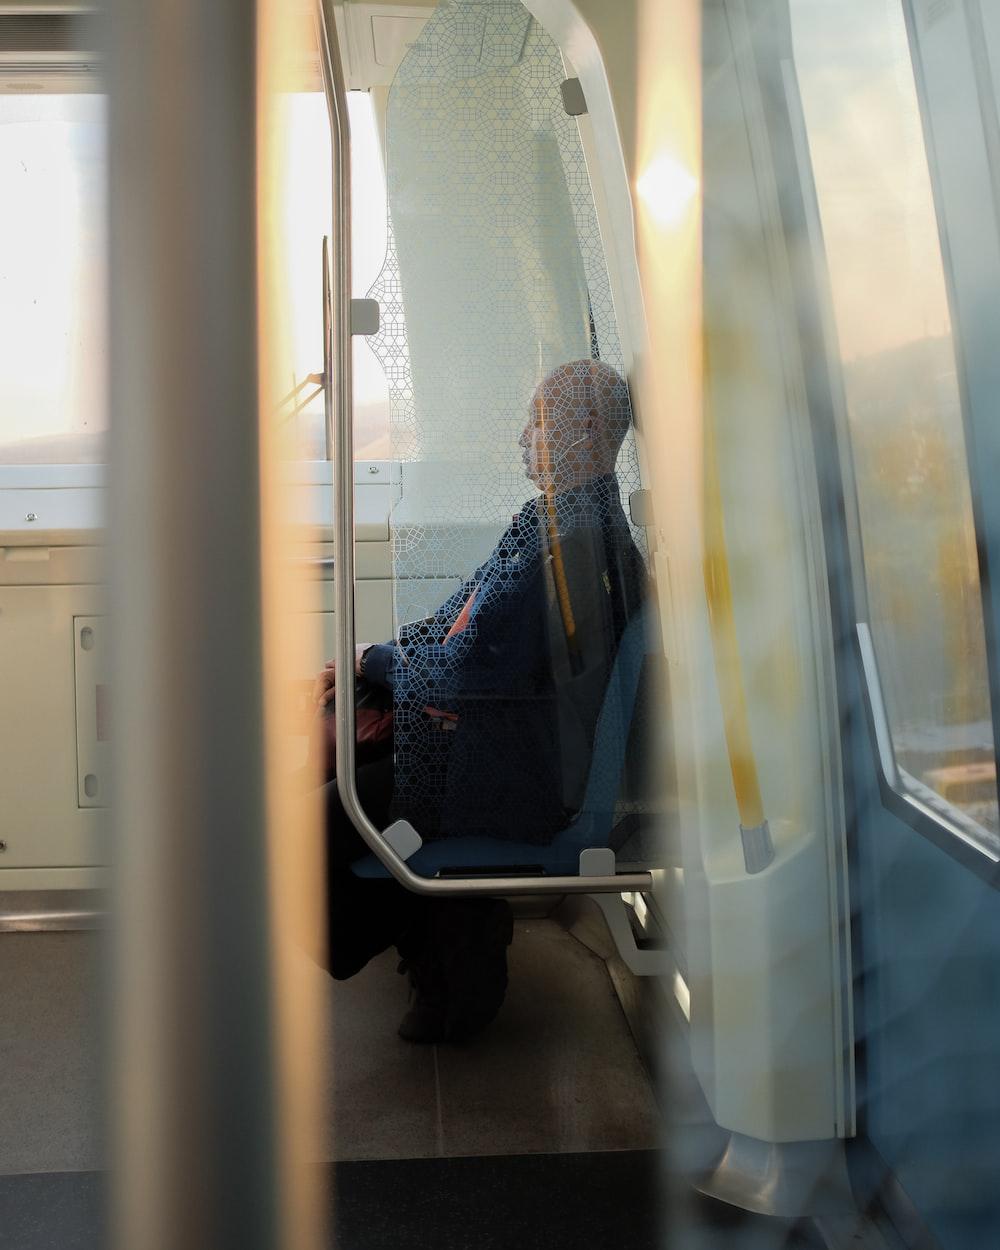 man sitting on vehicle seat